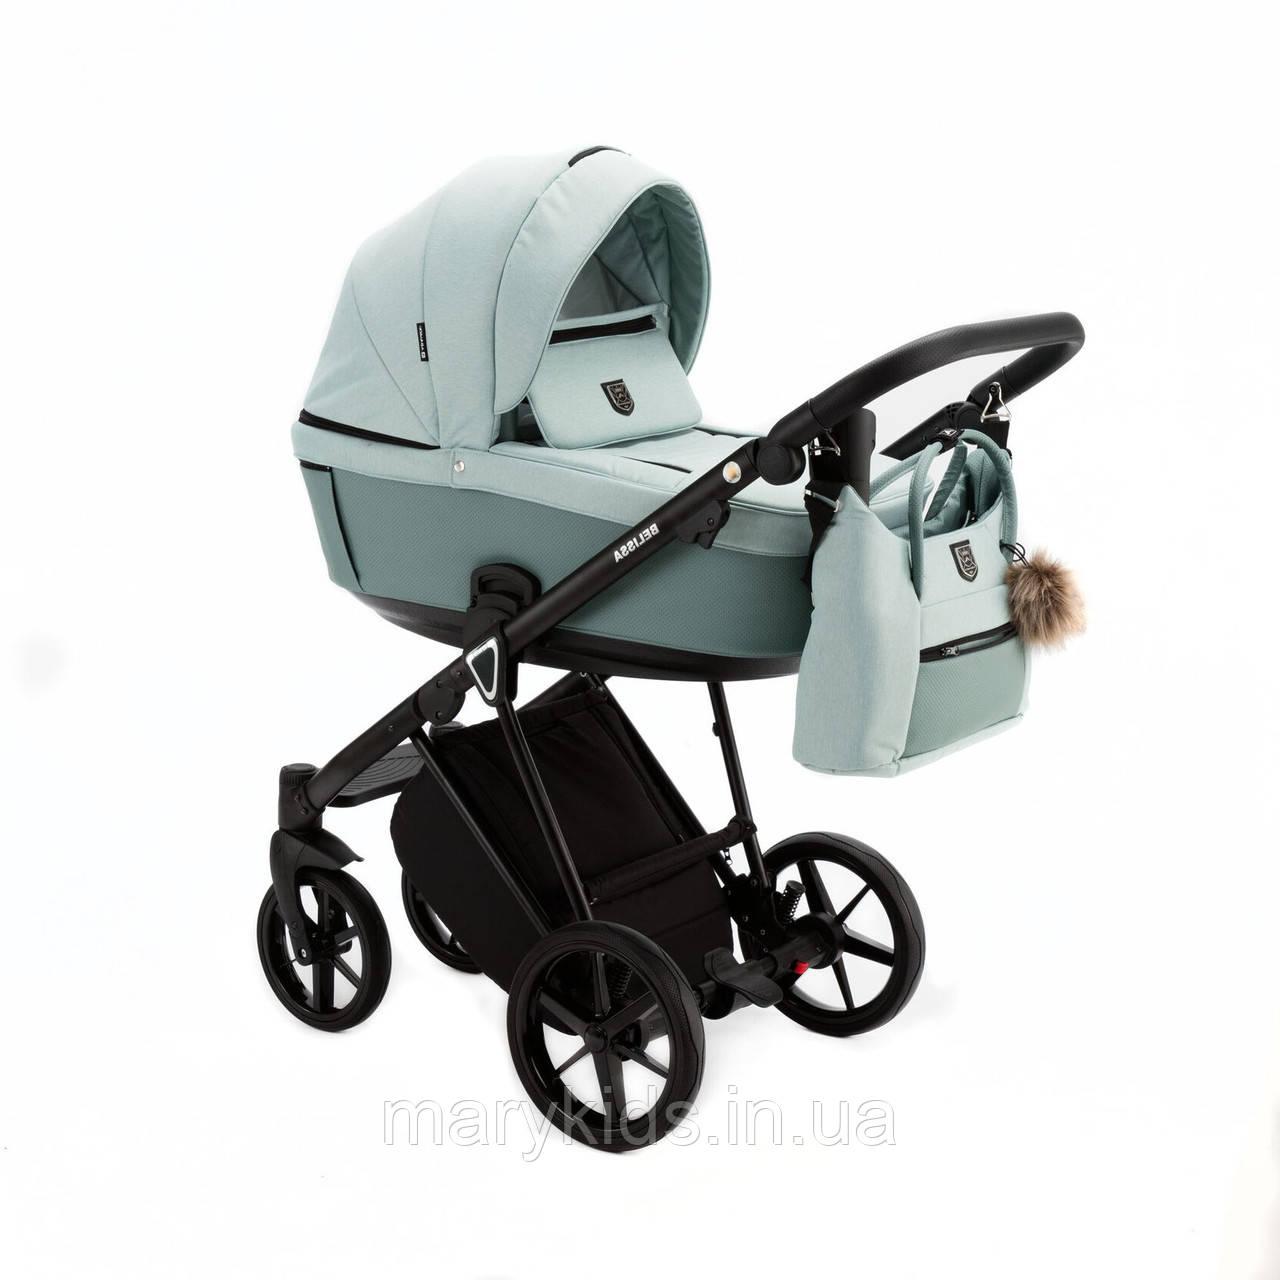 Дитяча універсальна коляска 2 в 1 Adamex Belissa PS-25